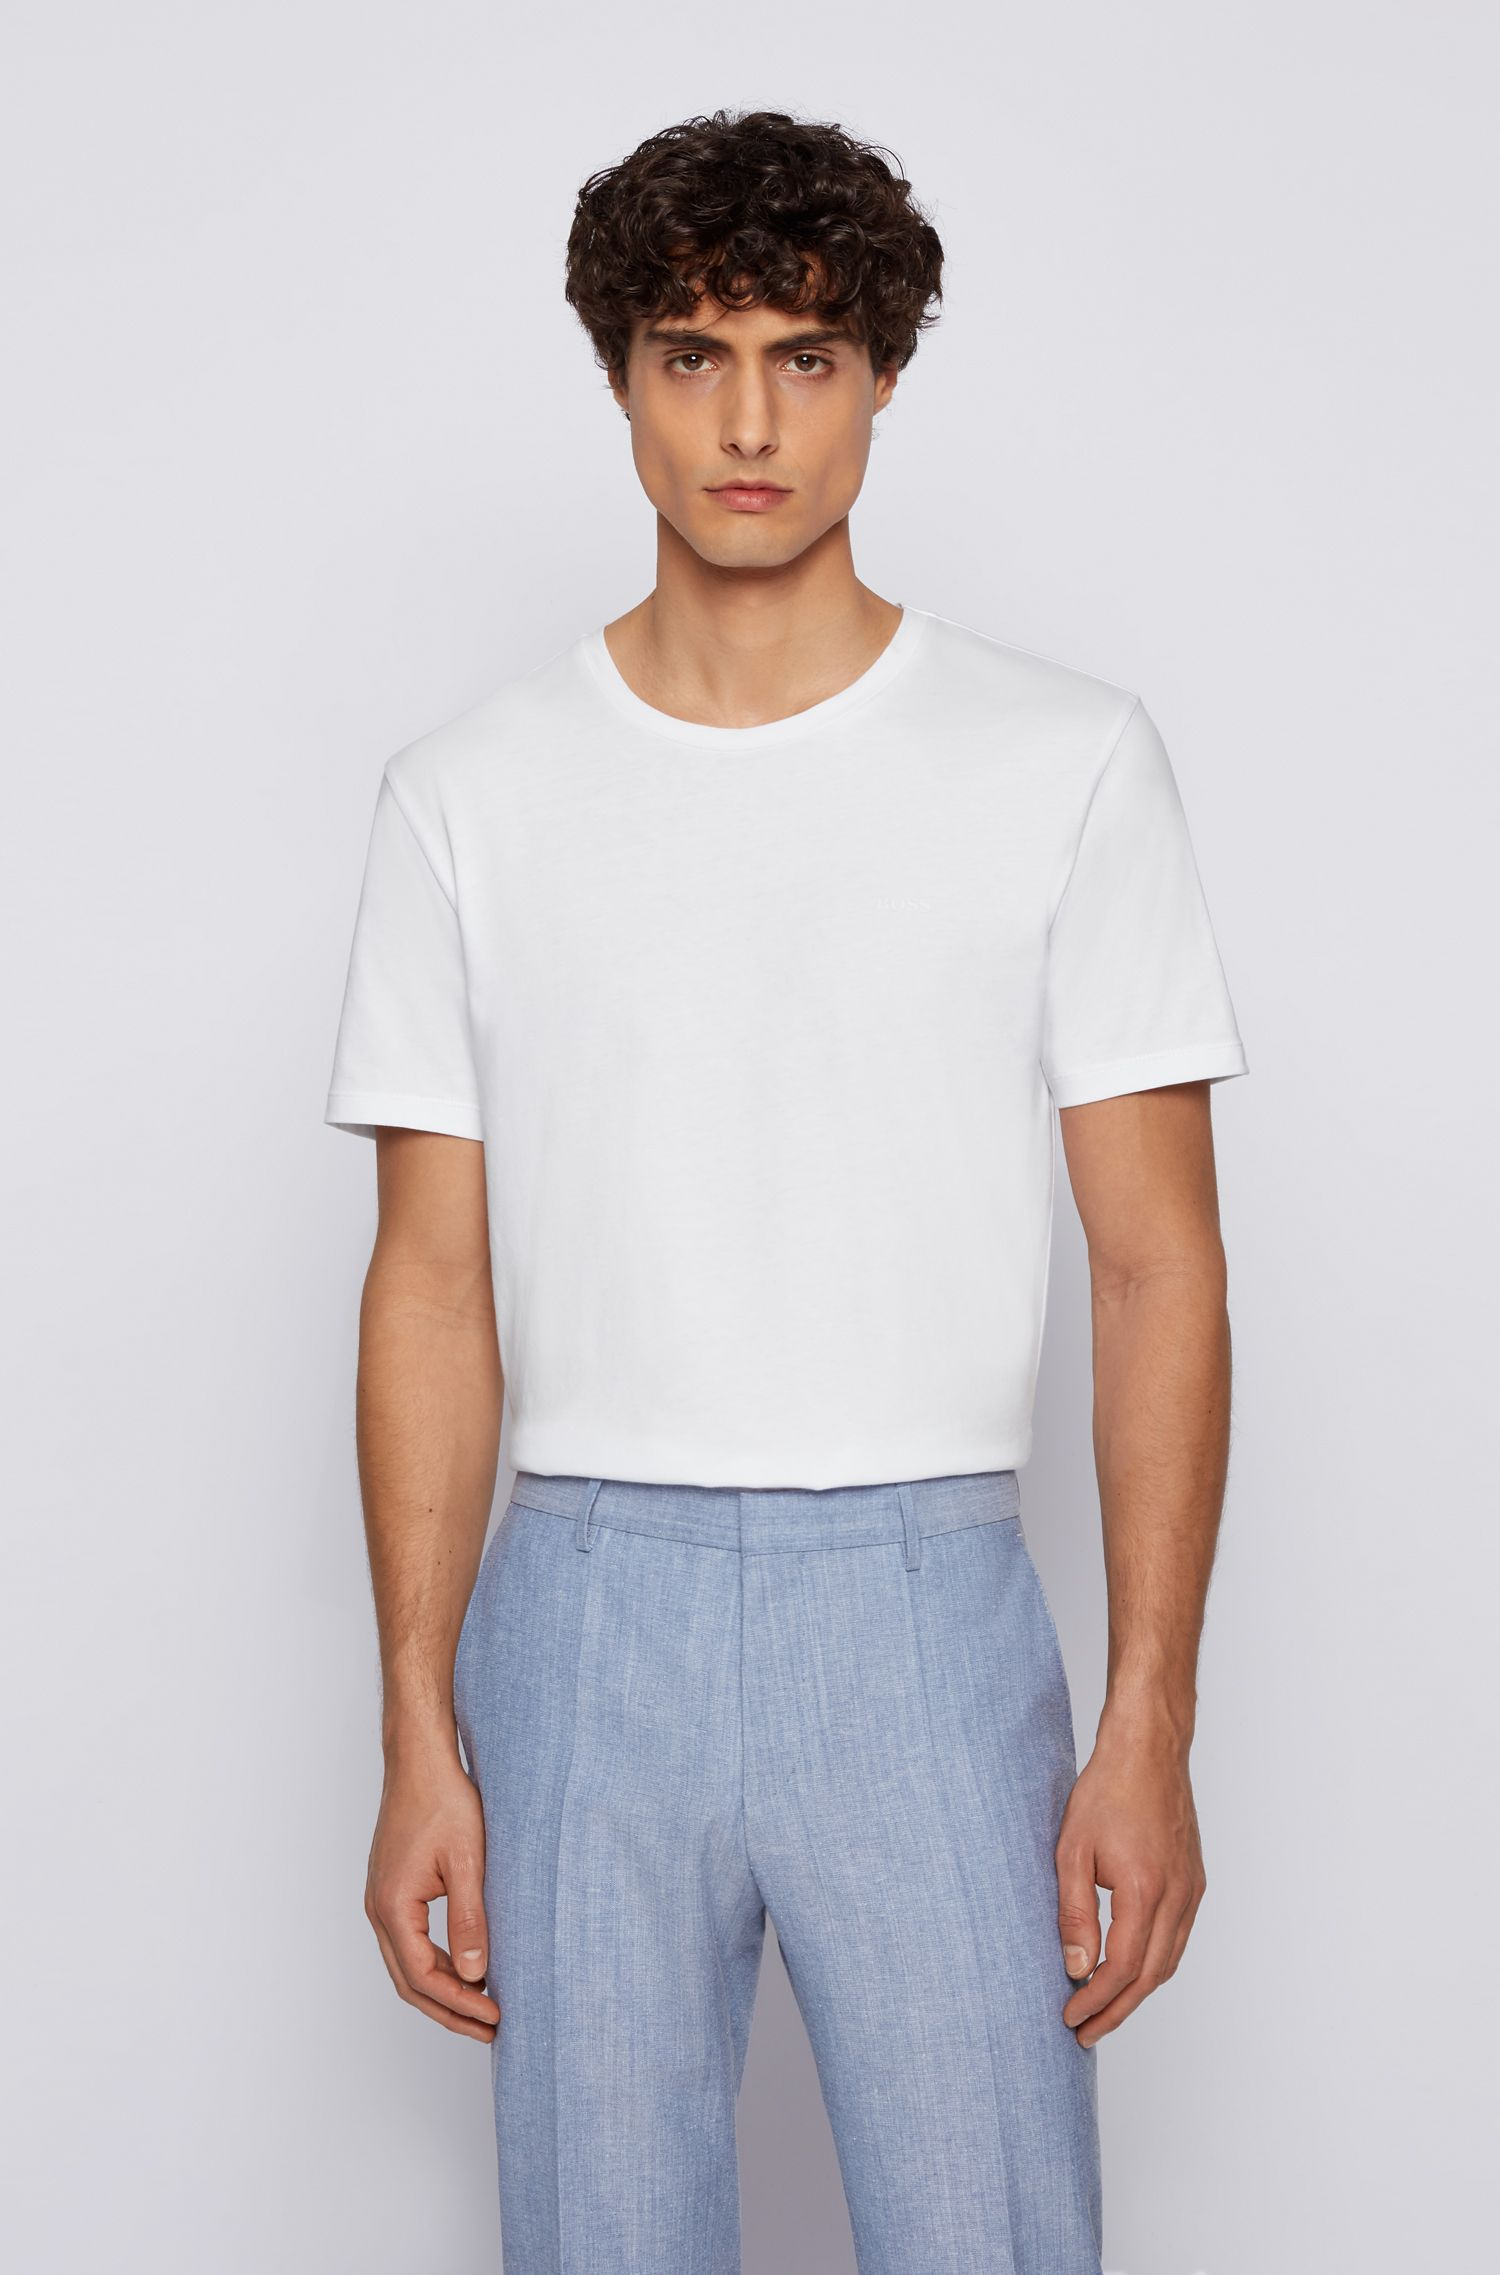 Camiseta de cuello redondo en punto sencillo teñido en hilo, Blanco